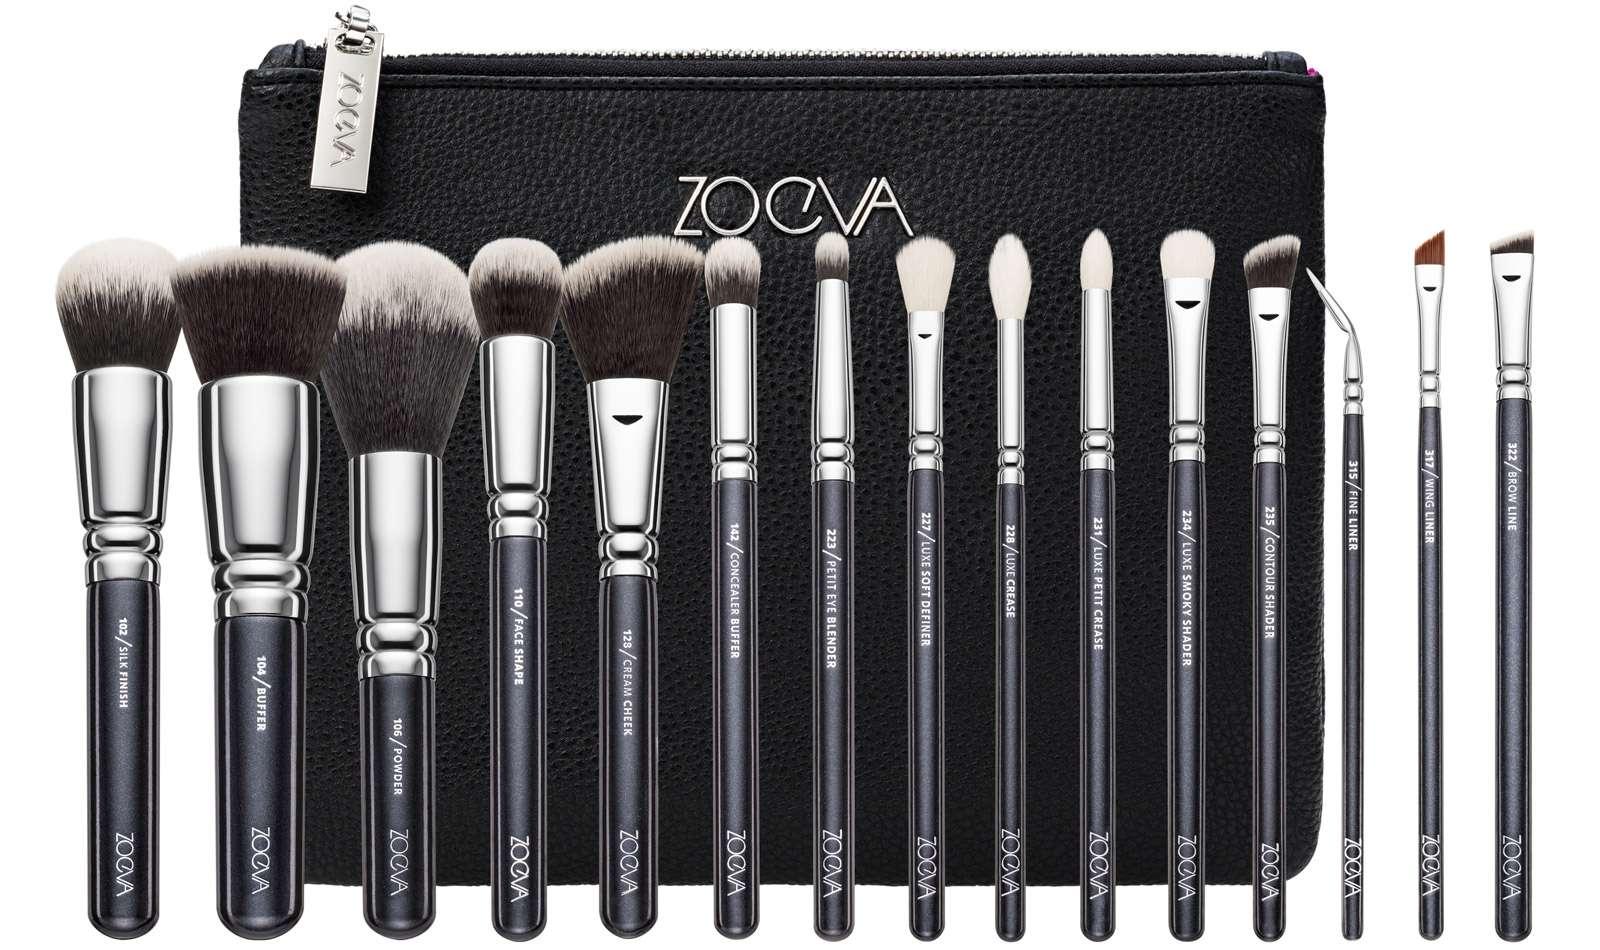 photo source: https://www.zoevacosmetics.com/america1/brush-sets/professional/210/complete-set?c=163